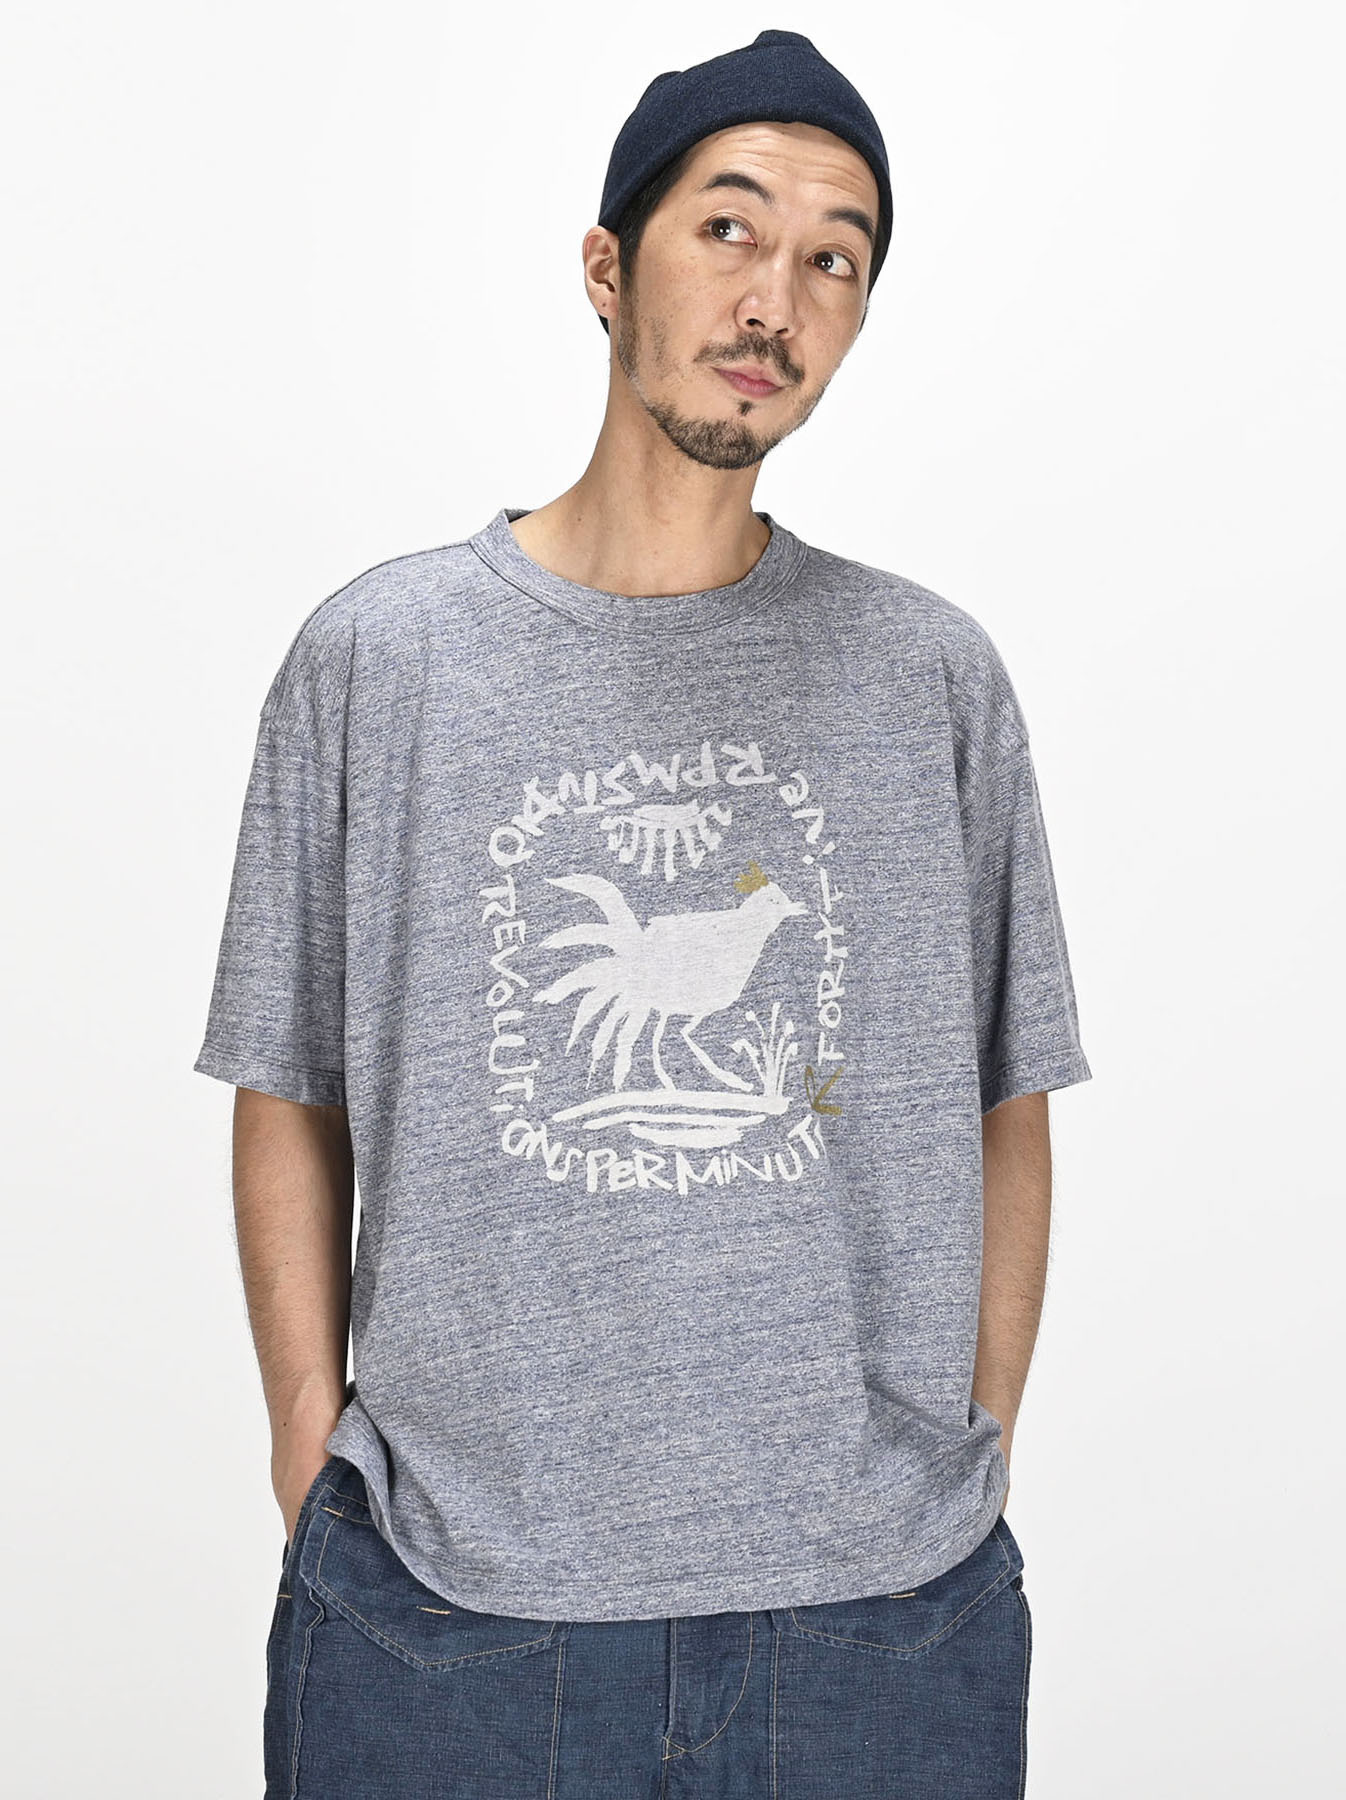 Top Sumite de Chicken T-shirt-2